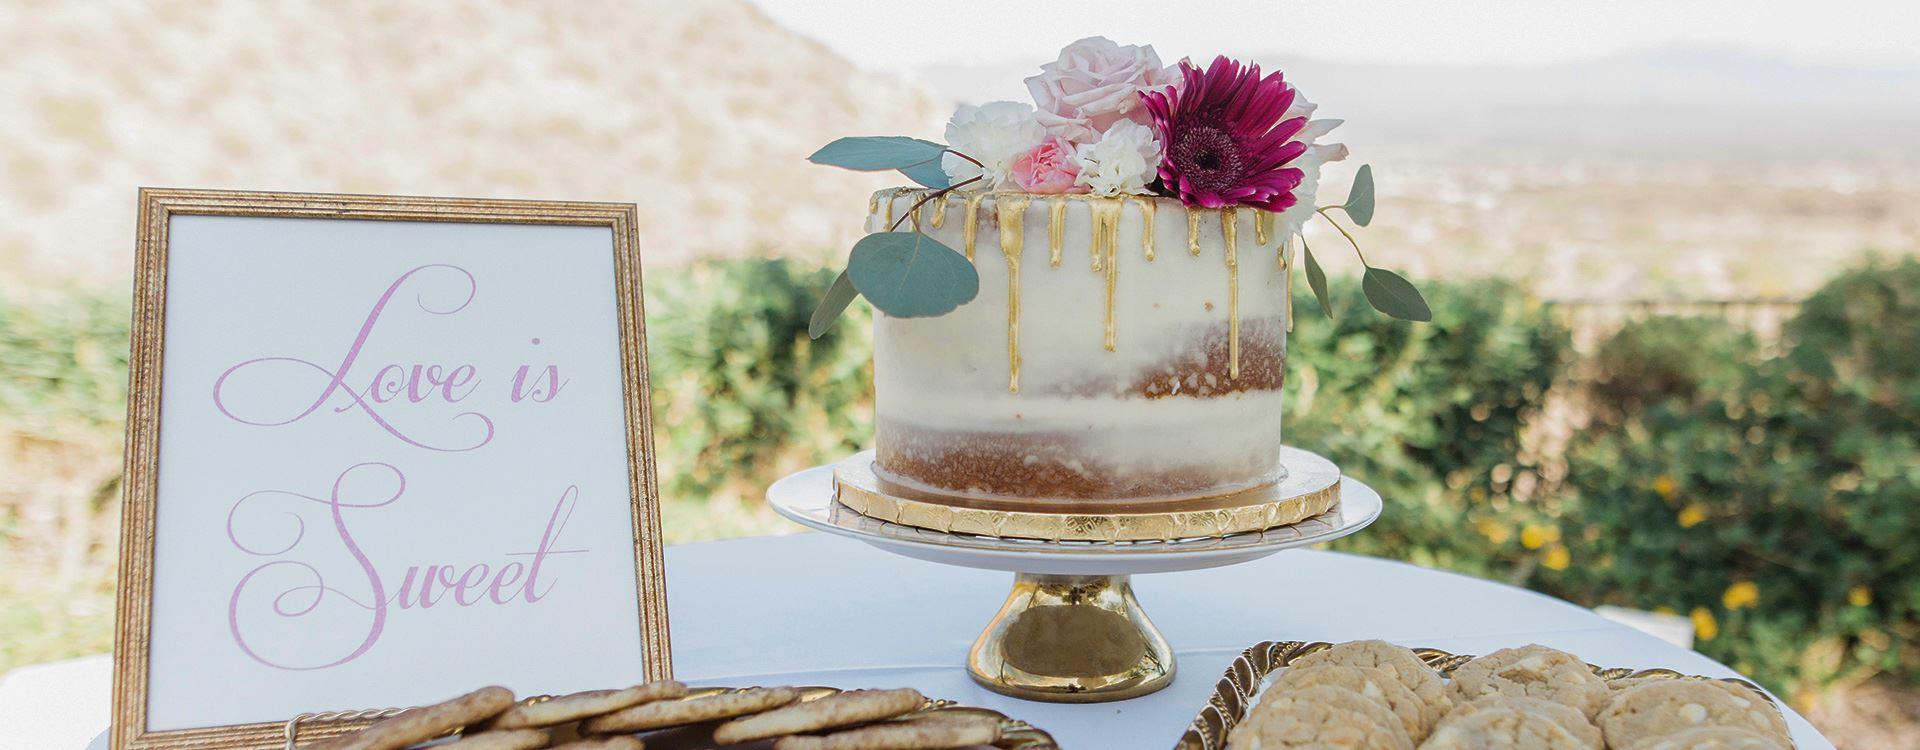 Wedding Services in Hotel Scottsdale